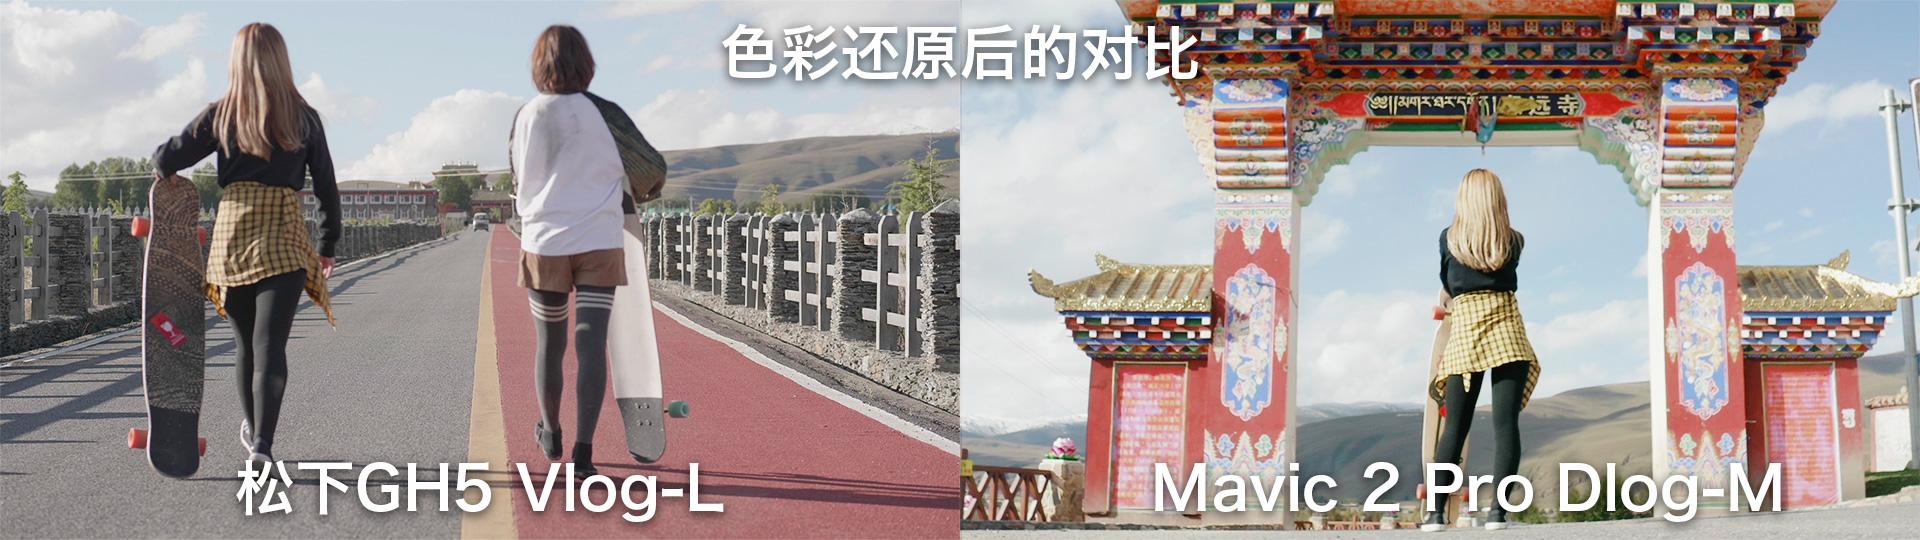 photo took by Matsushita GH5 vs. photo took by mavic 2 pro